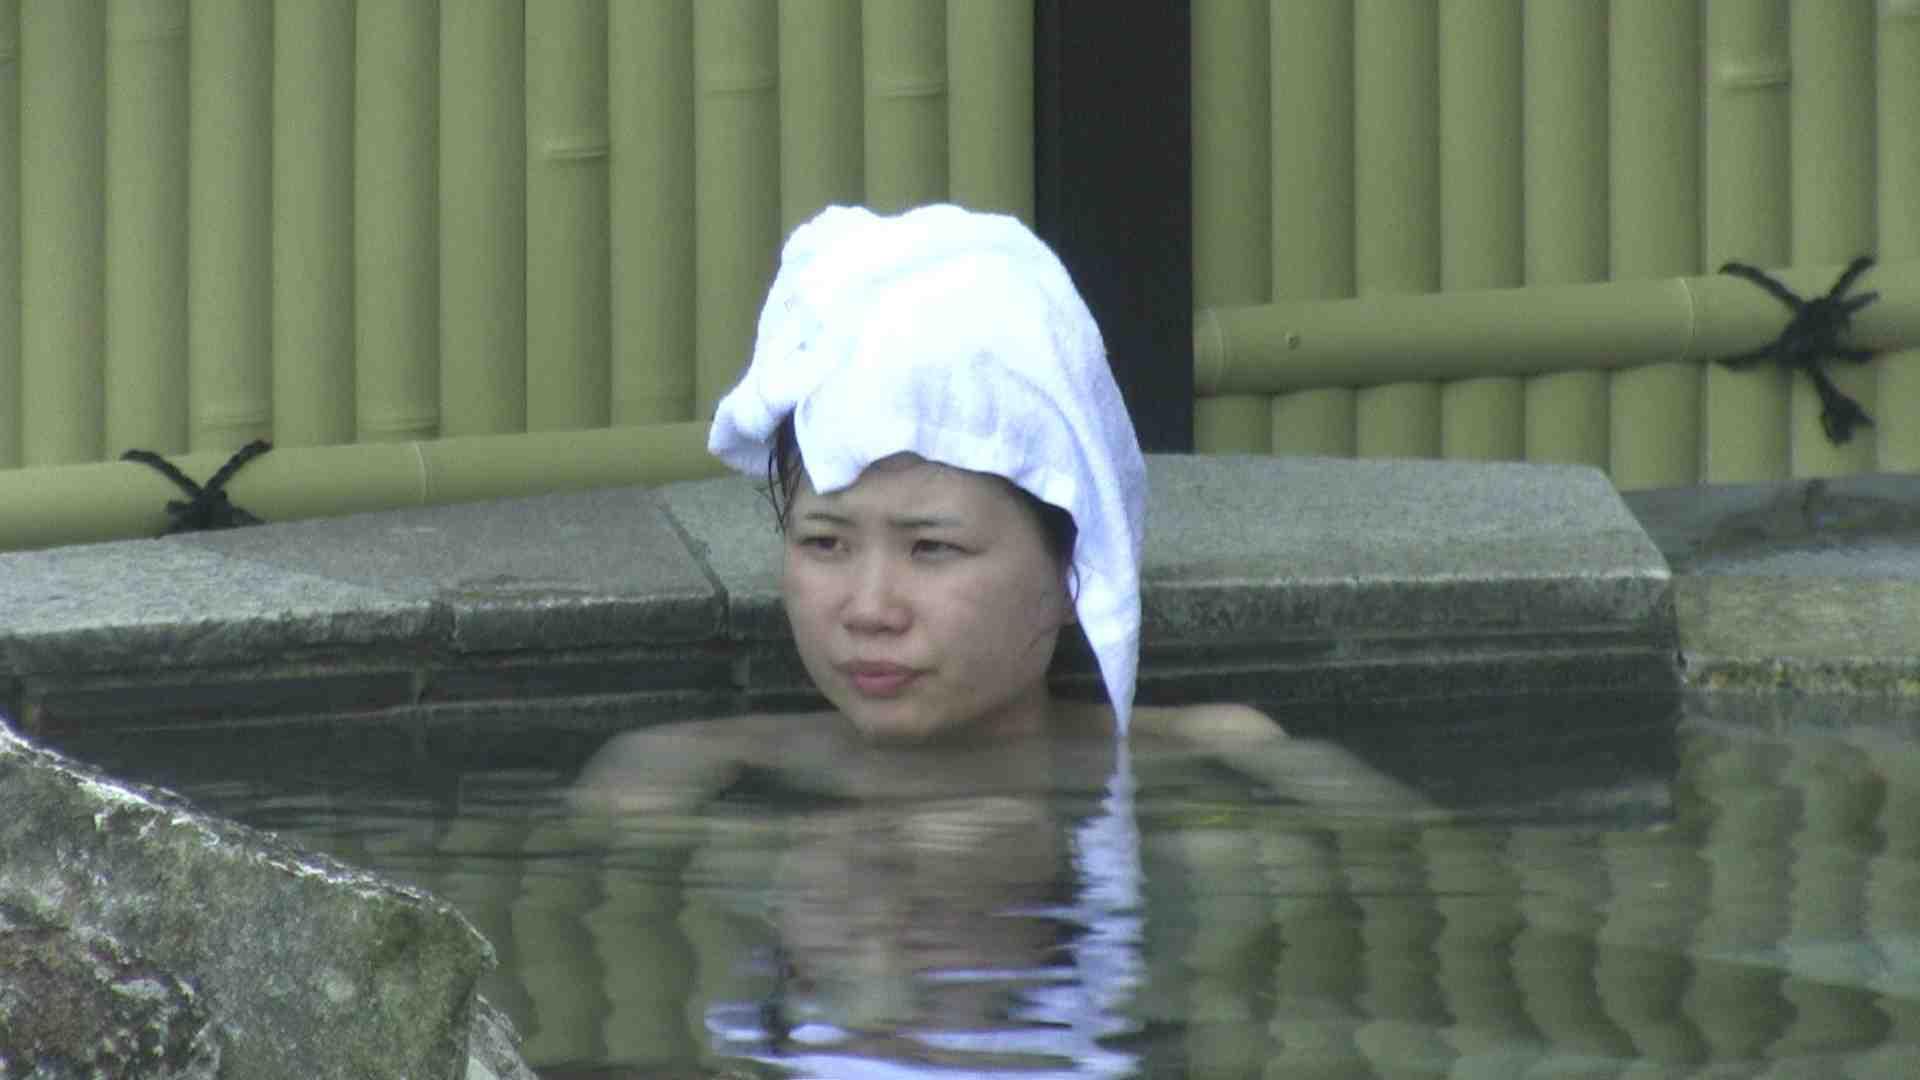 Aquaな露天風呂Vol.183 露天風呂編  104PIX 20